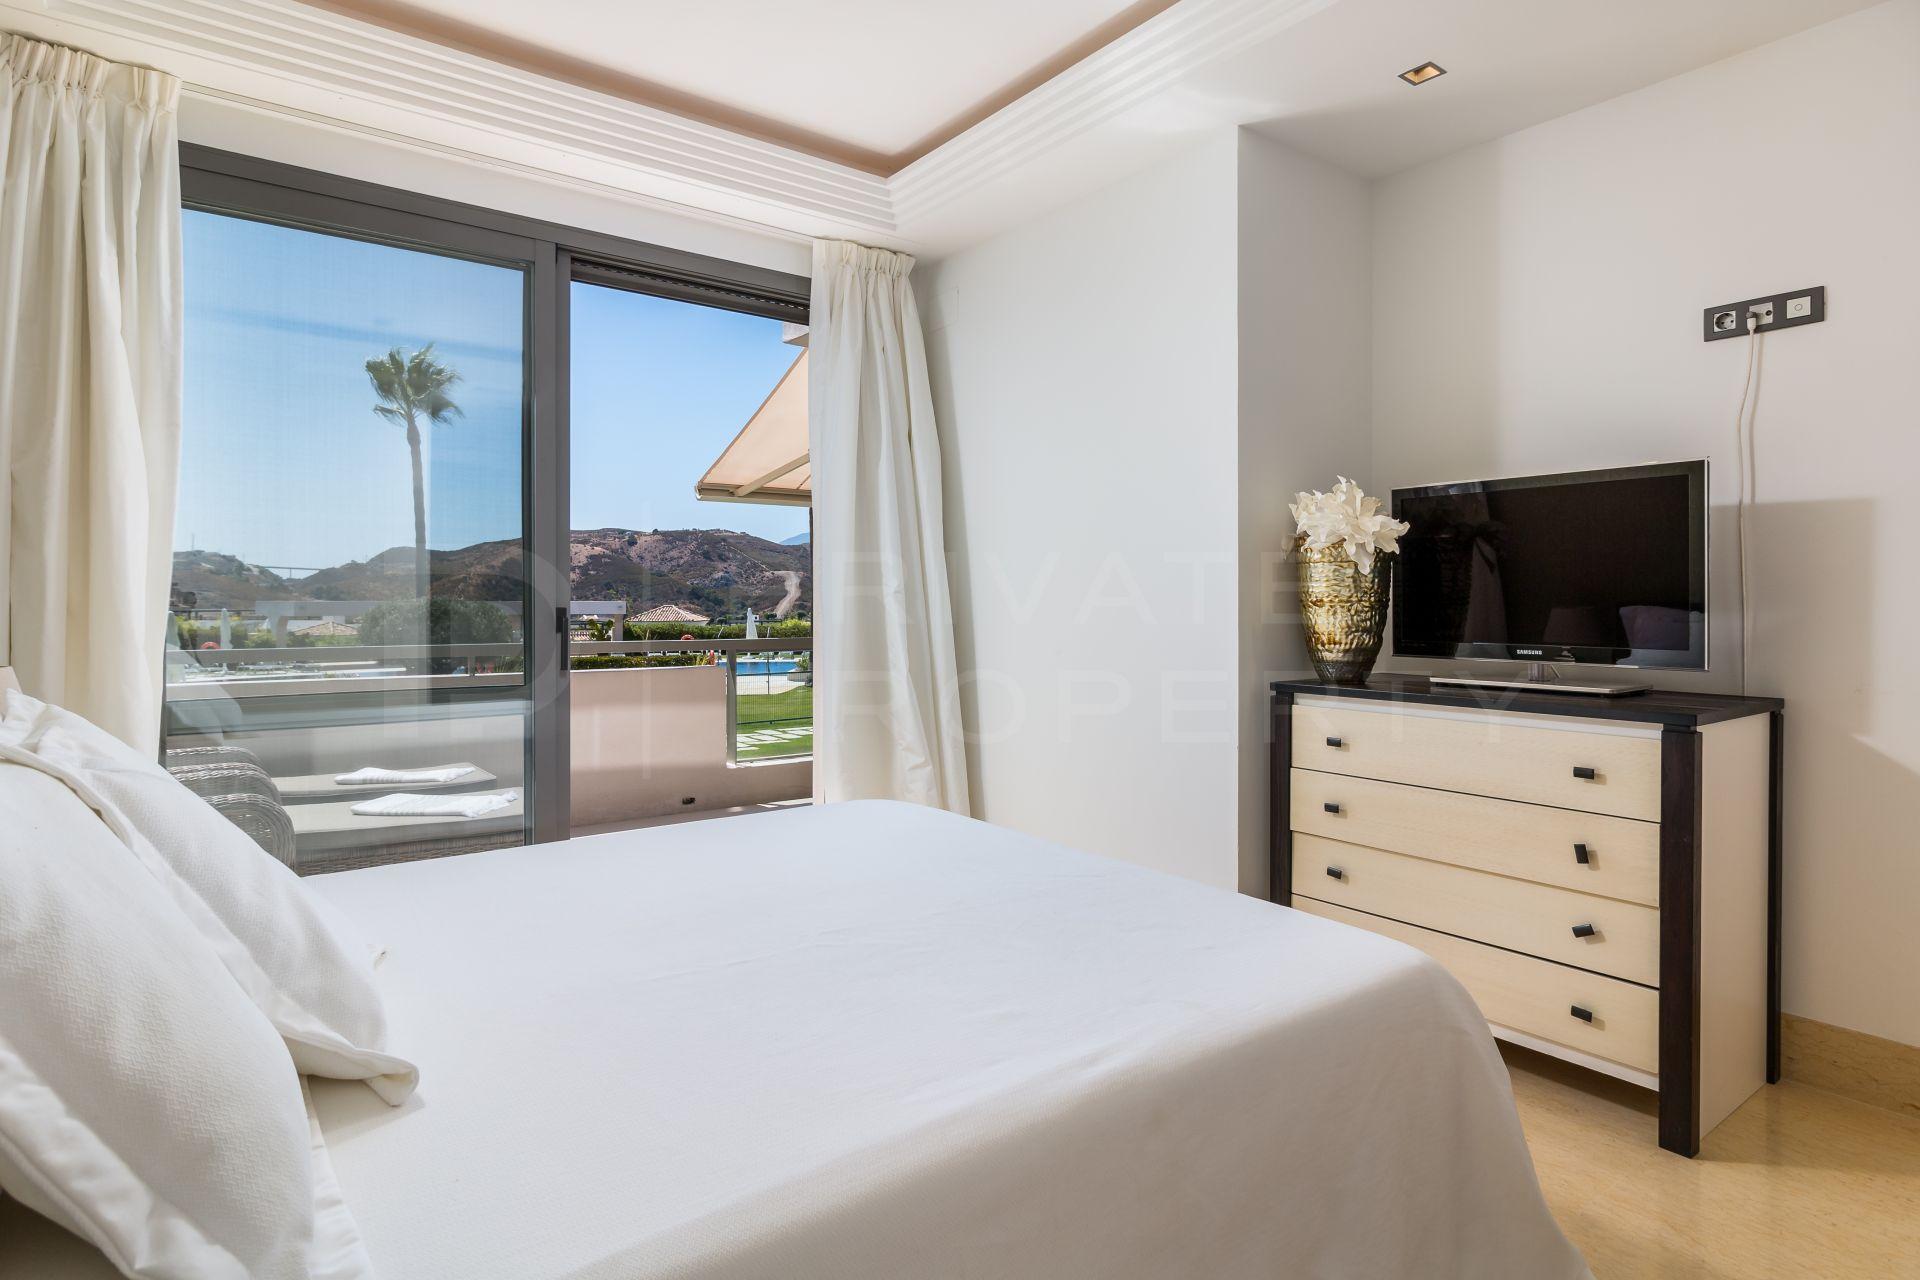 Impeccable apartment in Benahavis